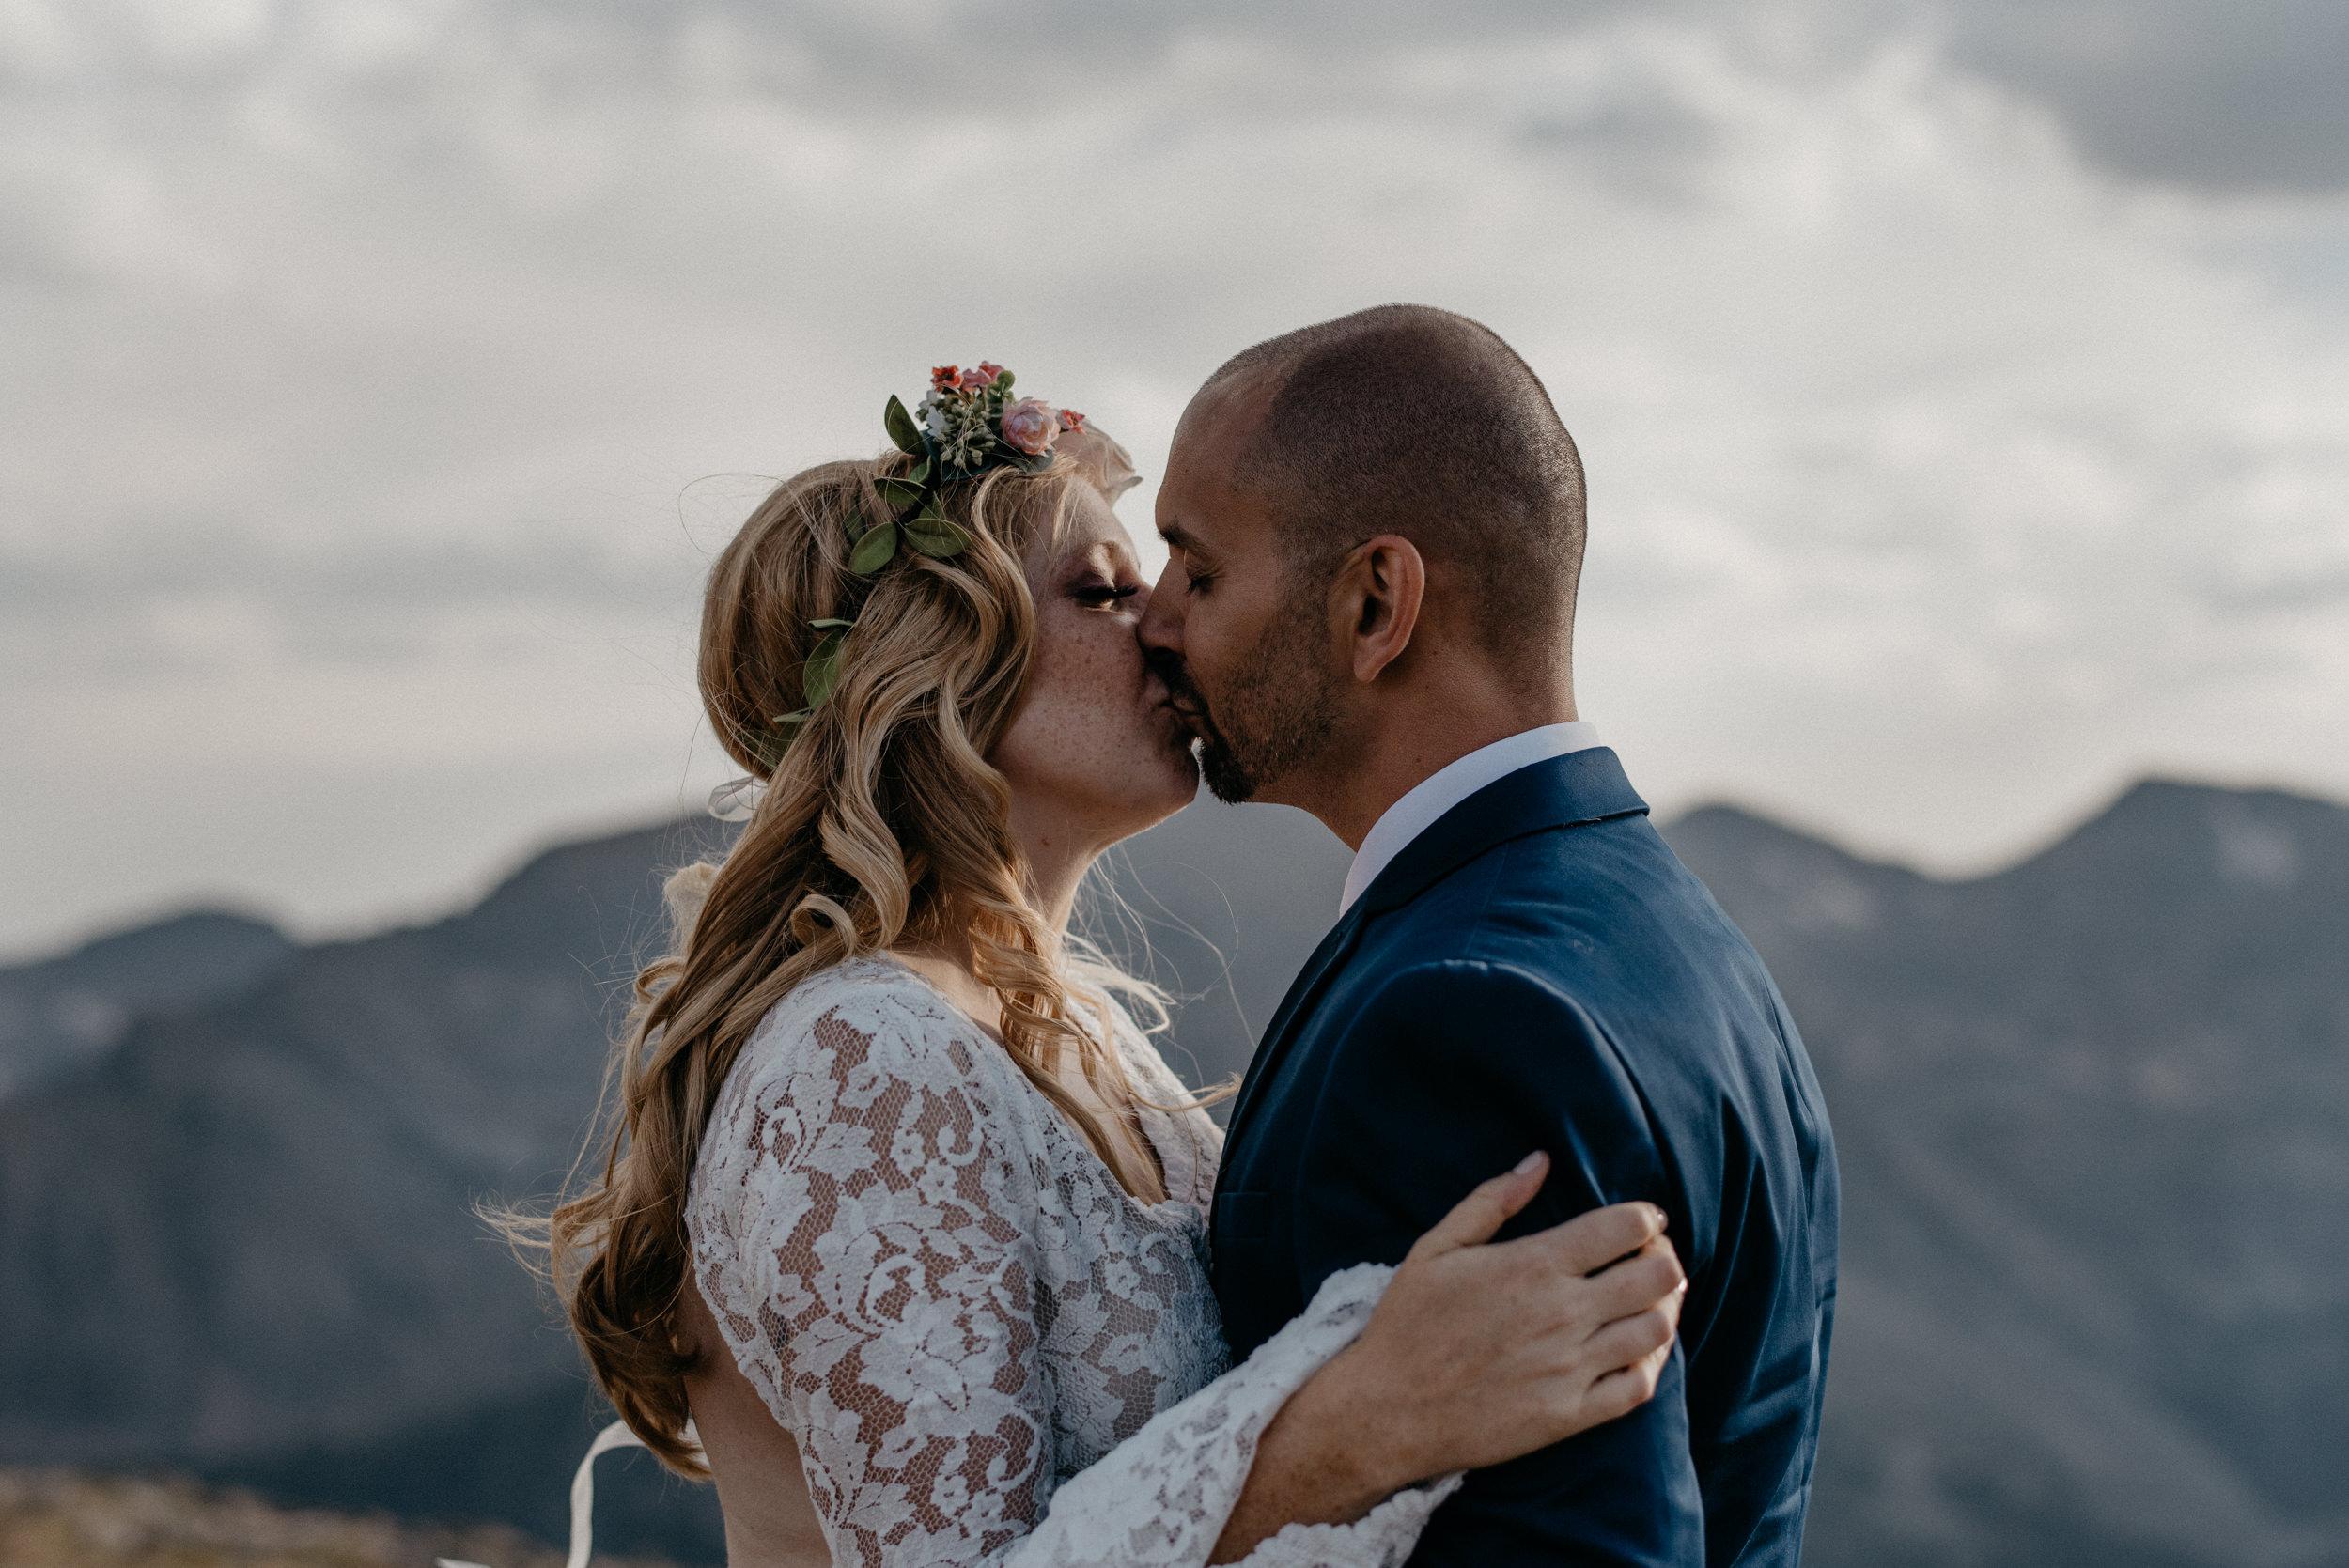 Colorado boho wedding photographer. Epic adventure elopement in Rocky Mountain National Park.